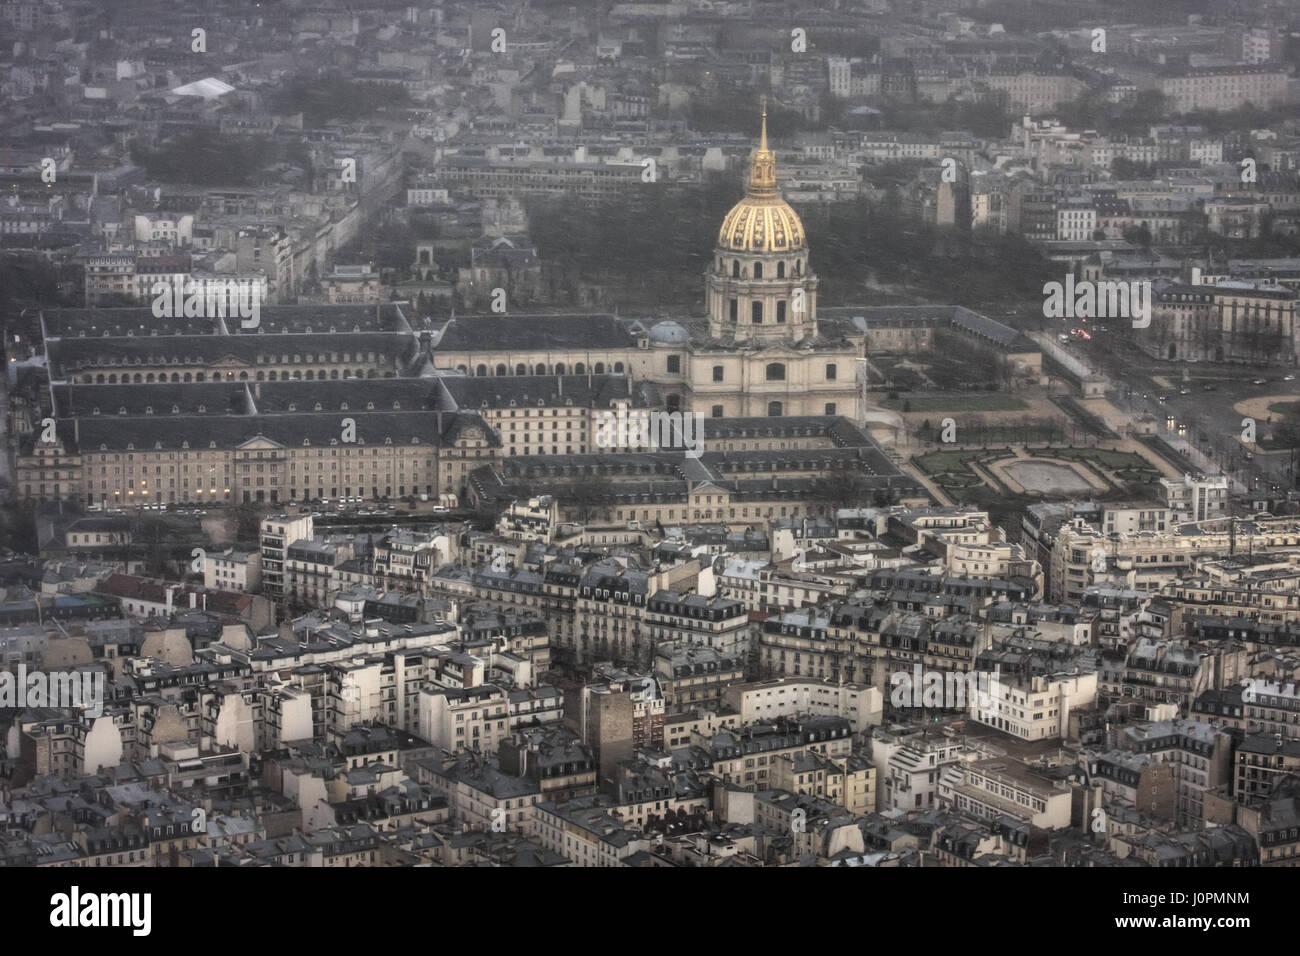 L'hôtel national des Invalides during a spring snowstorm. Paris. France - Stock Image